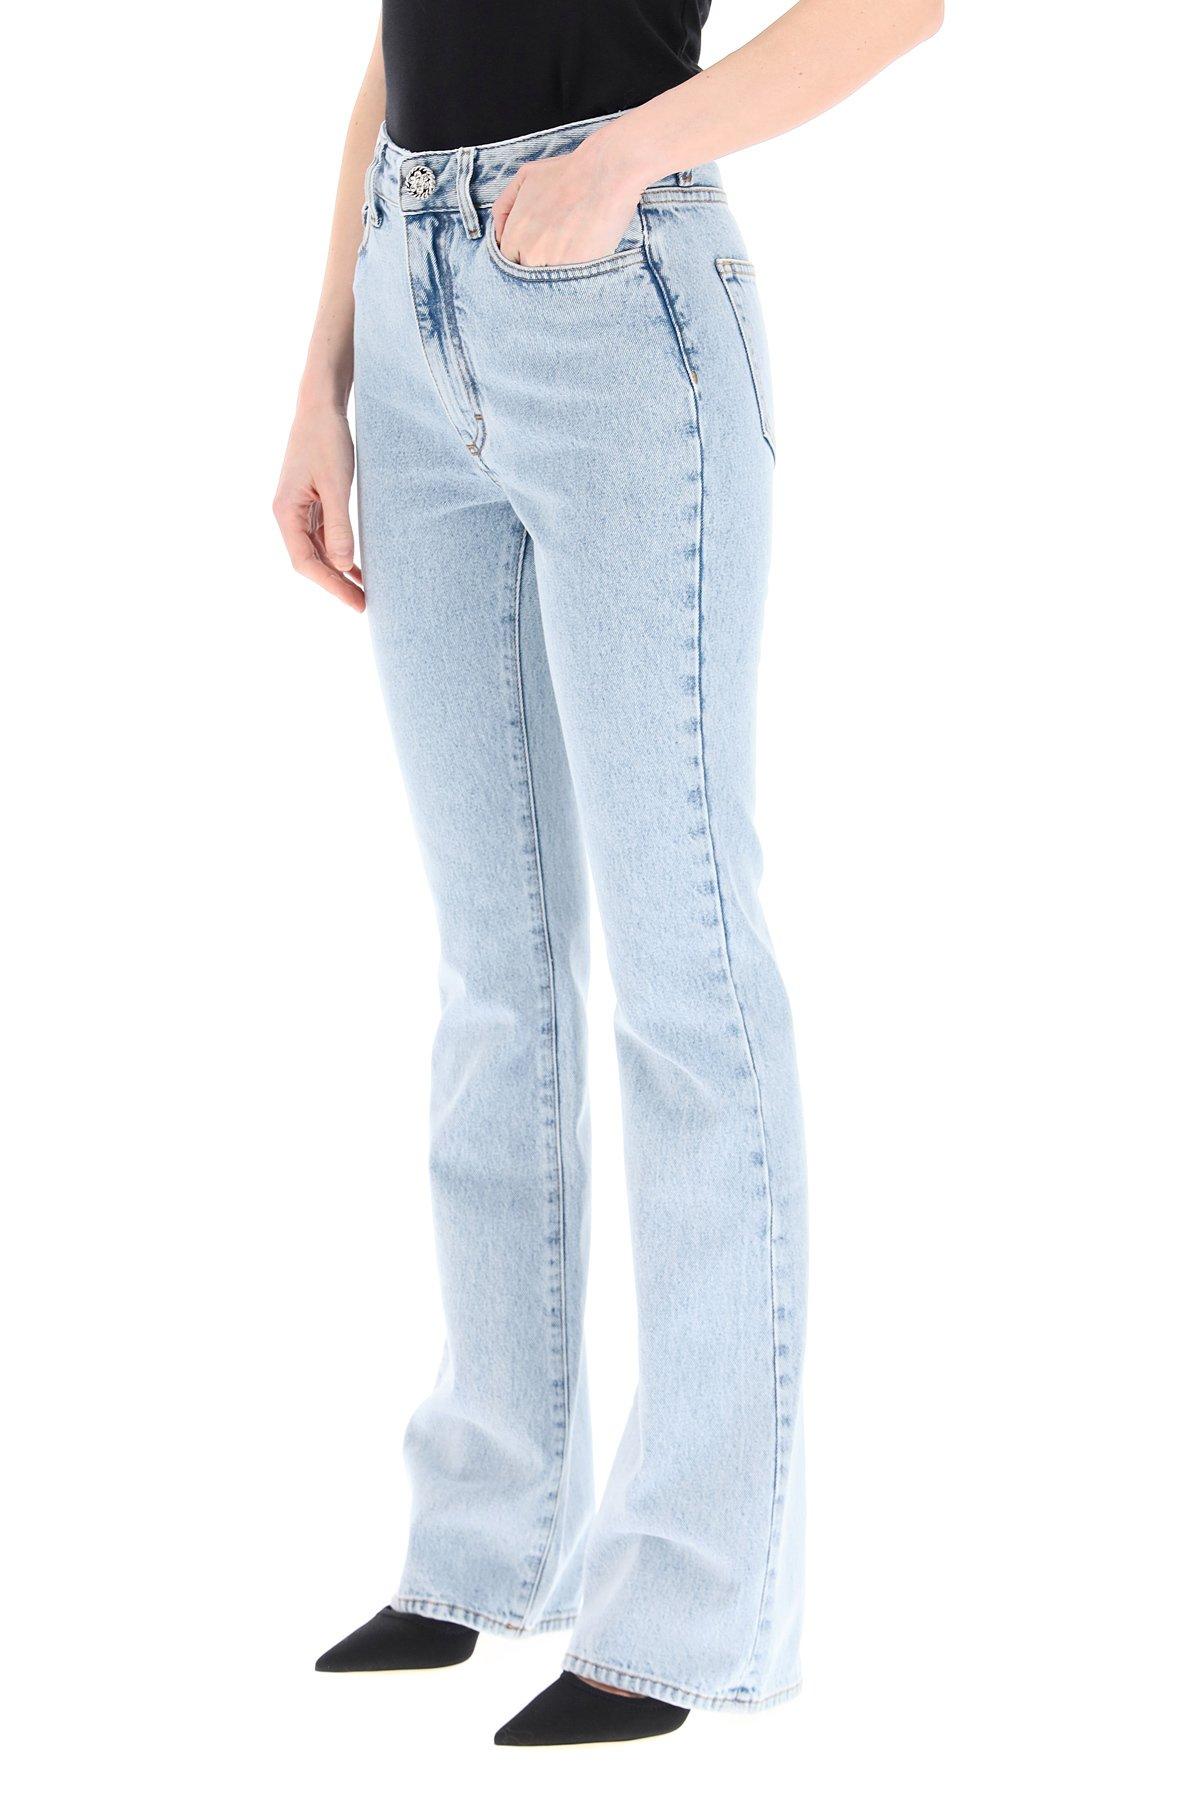 Alessandra rich jeans flare a vita alta